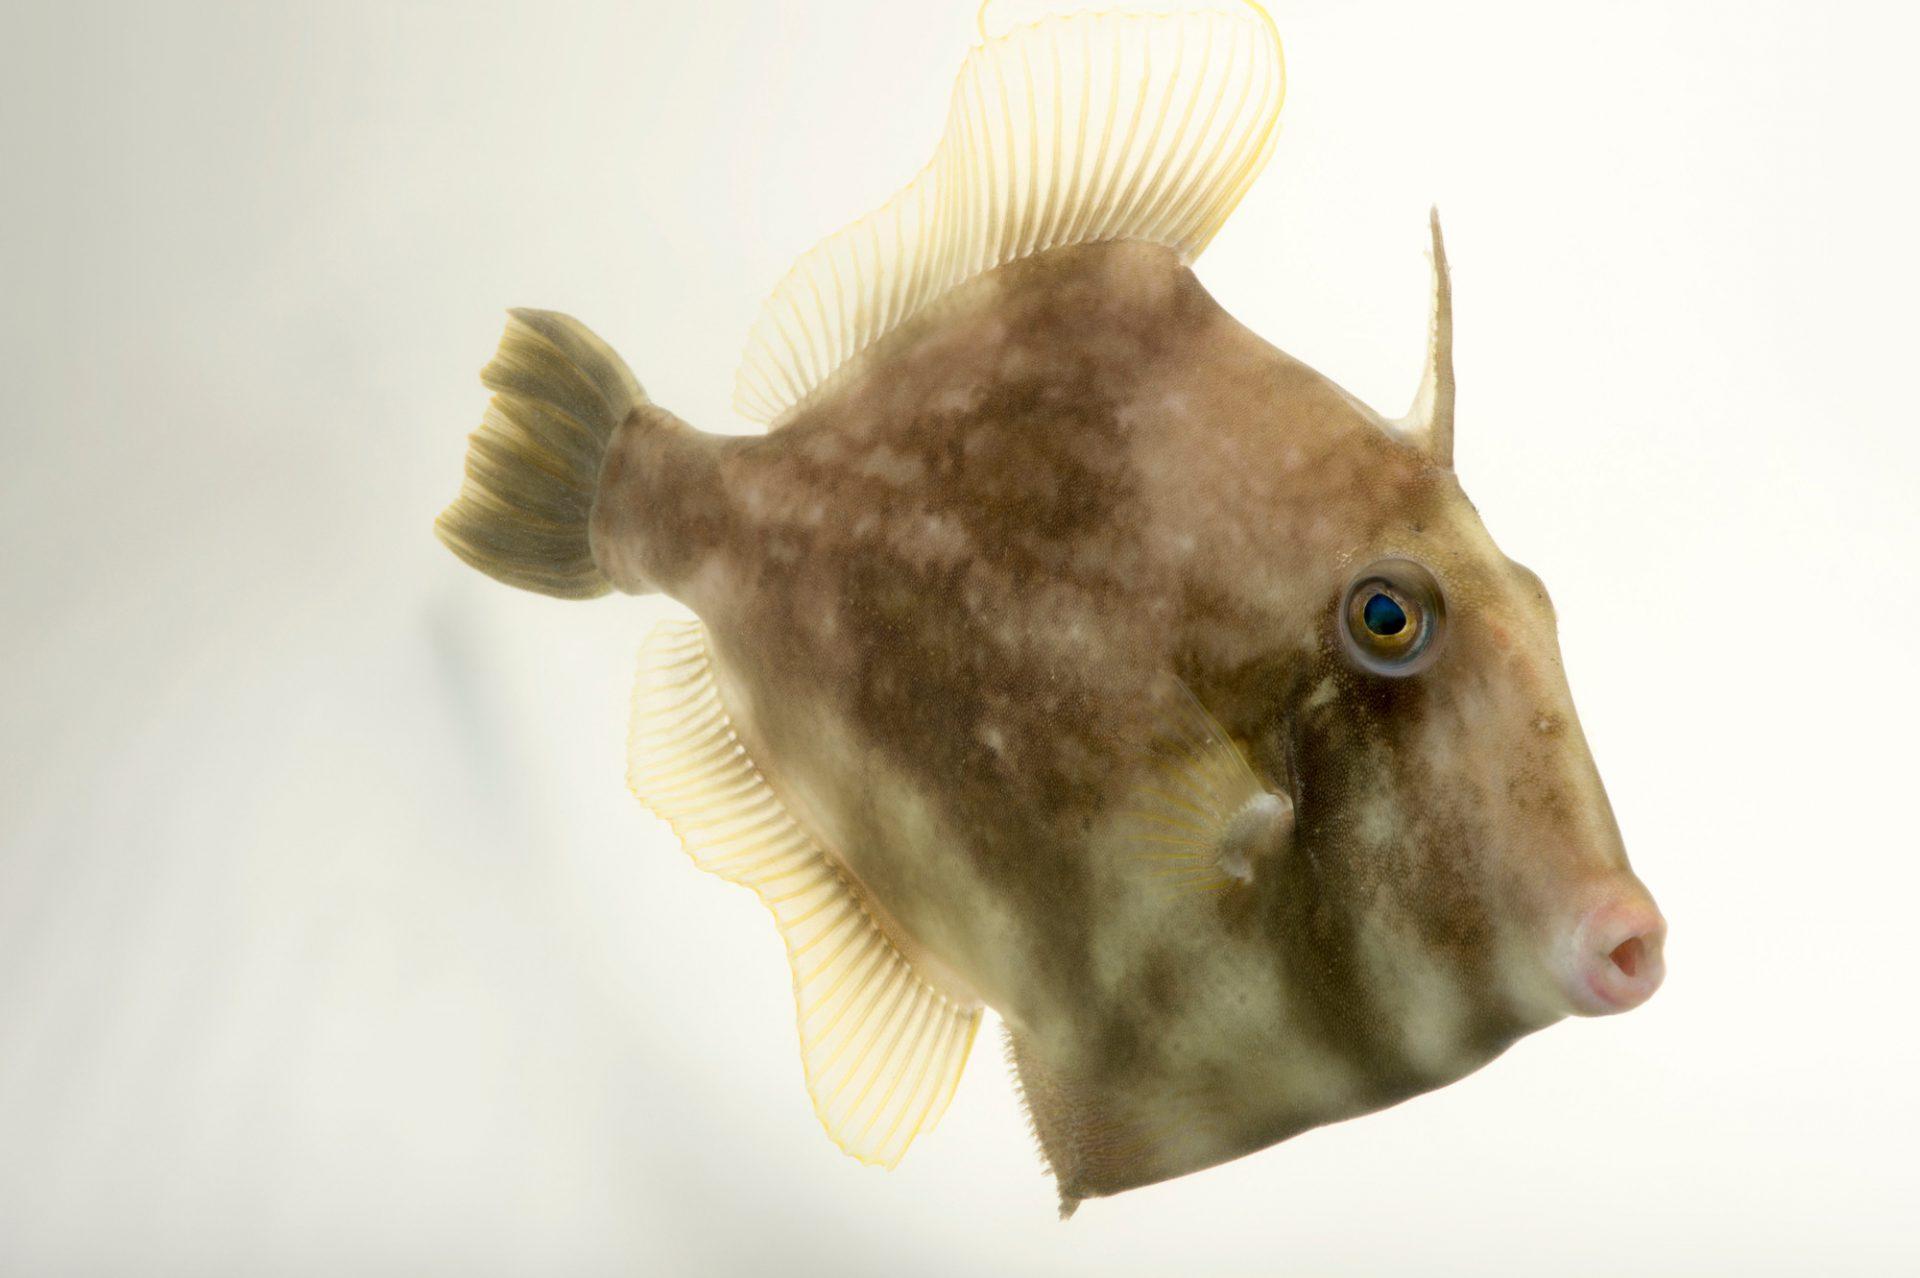 Picture of a planehead filefish (Stephanolepis hispidus) at the Newport Aquarium.